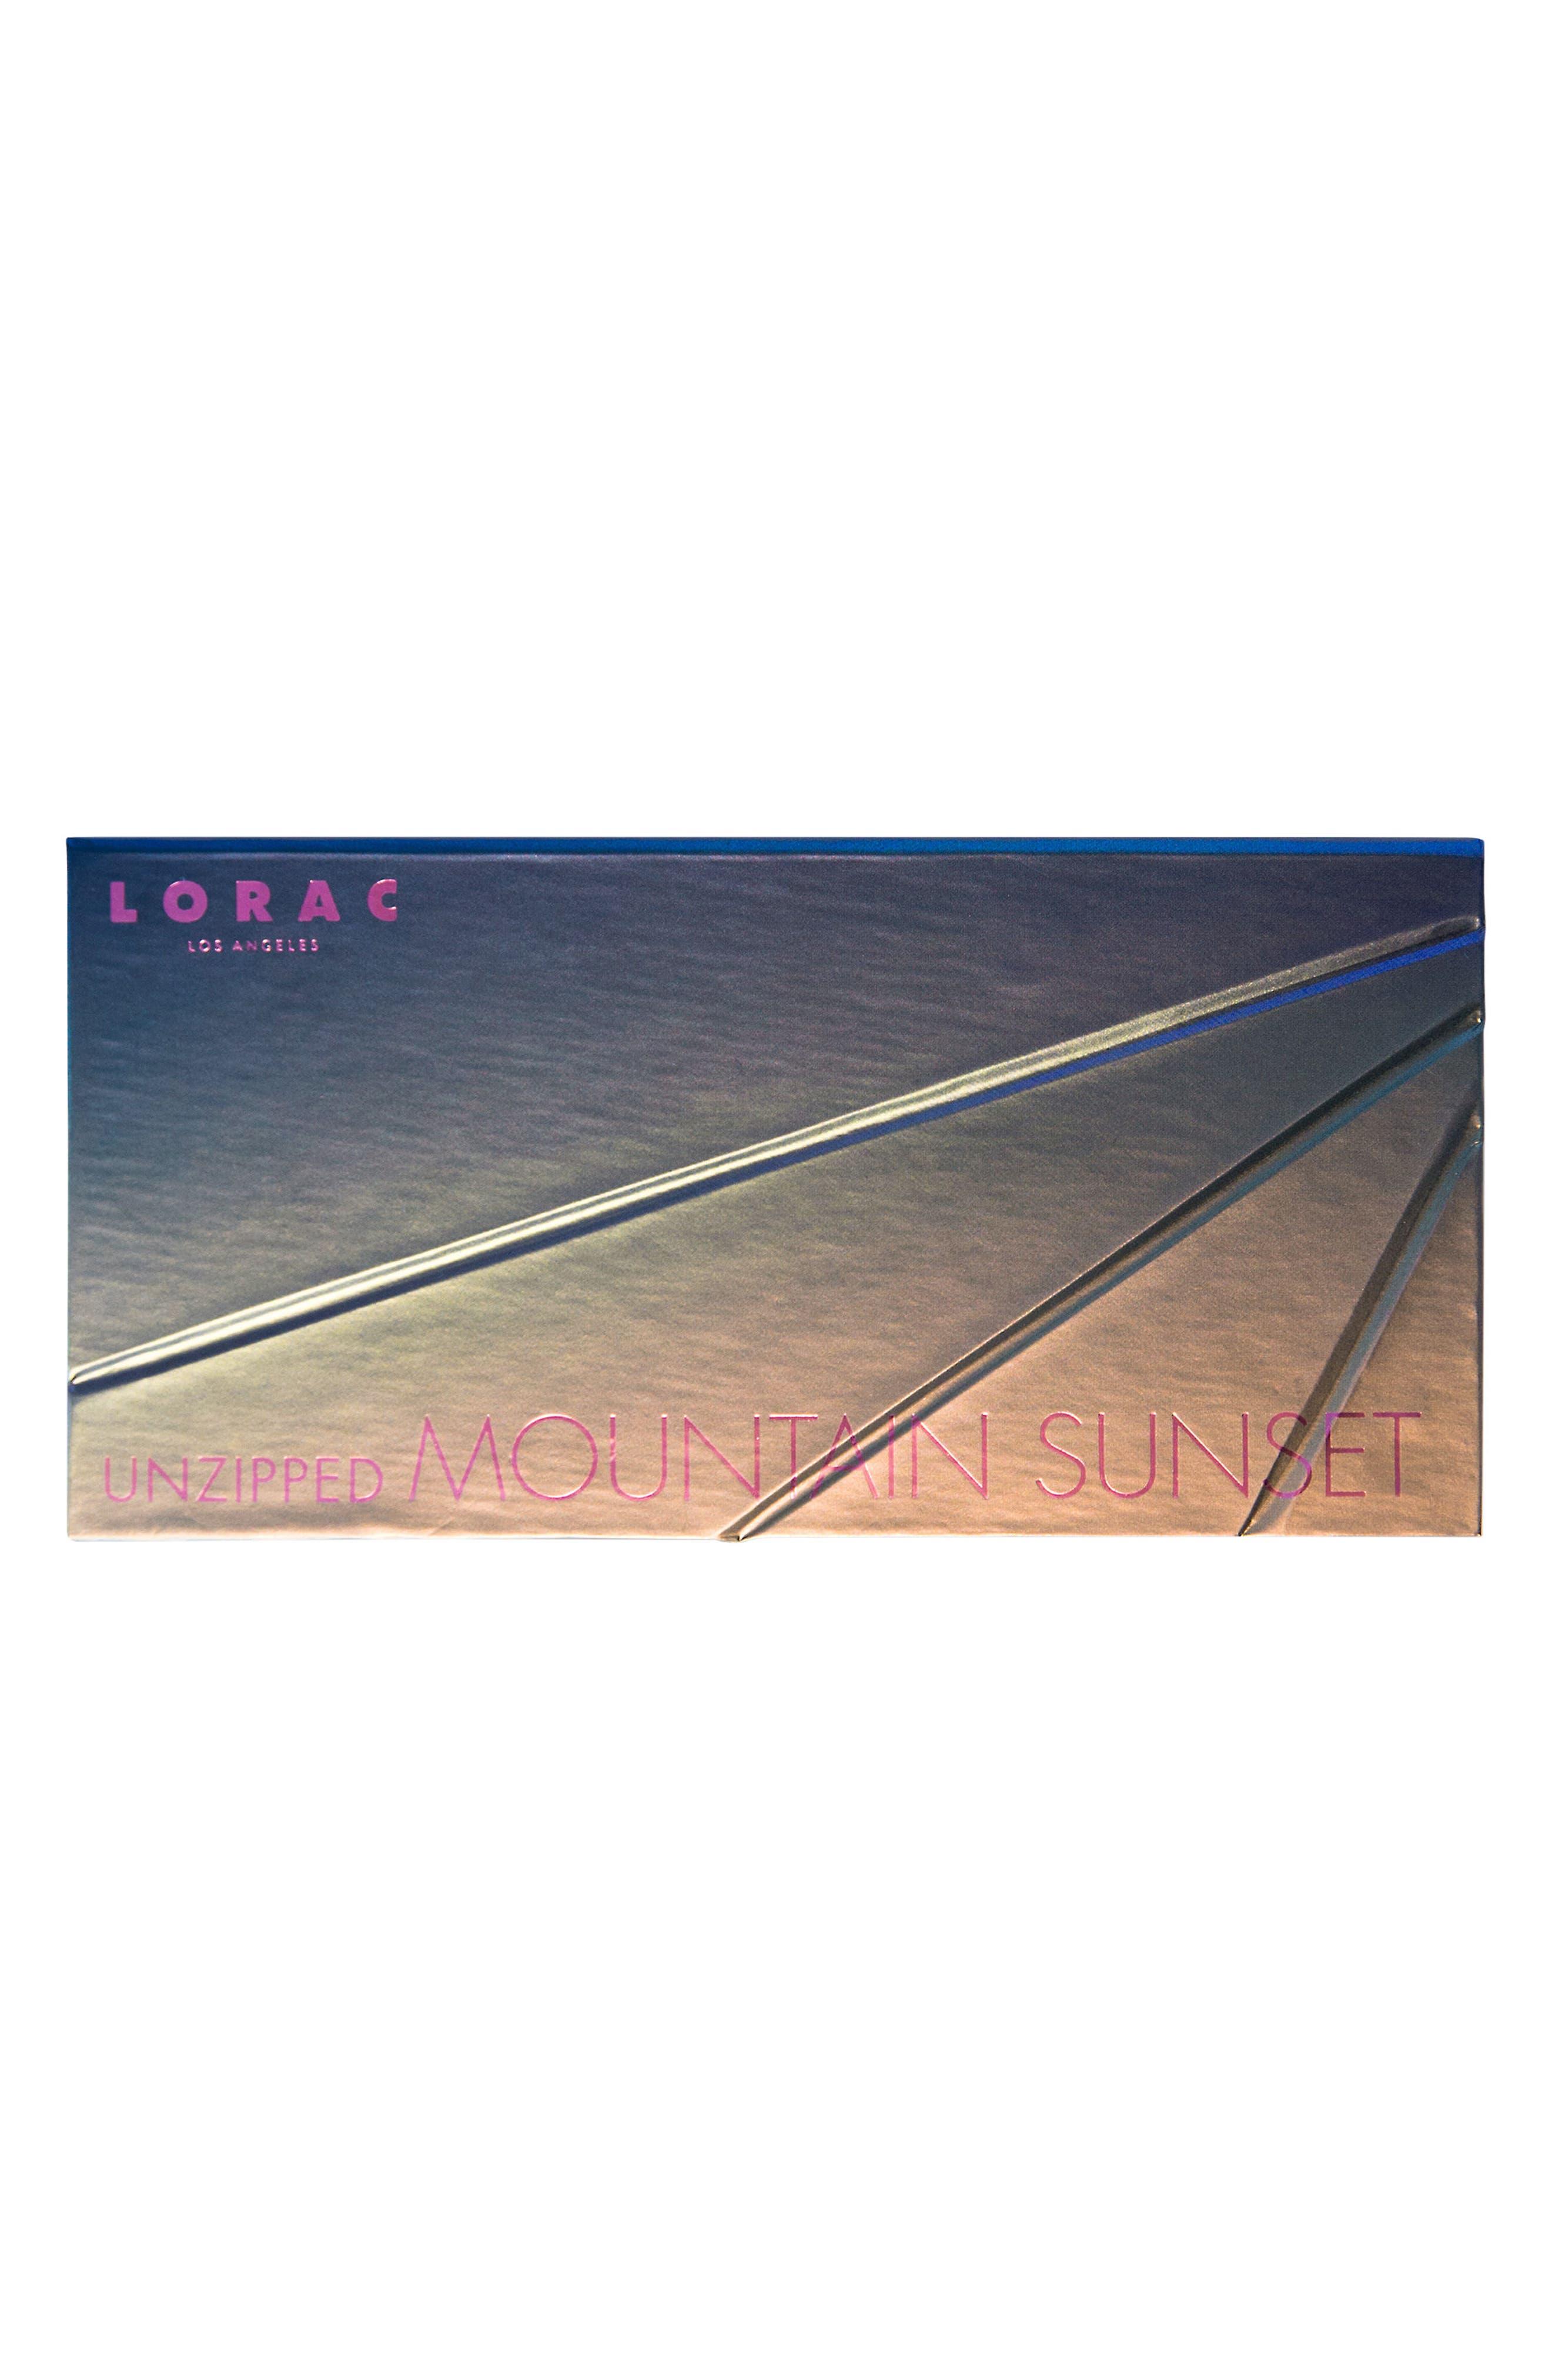 Alternate Image 3  - LORAC Unzipped Mountain Sunset Eyeshadow Palette (Limited Edition)